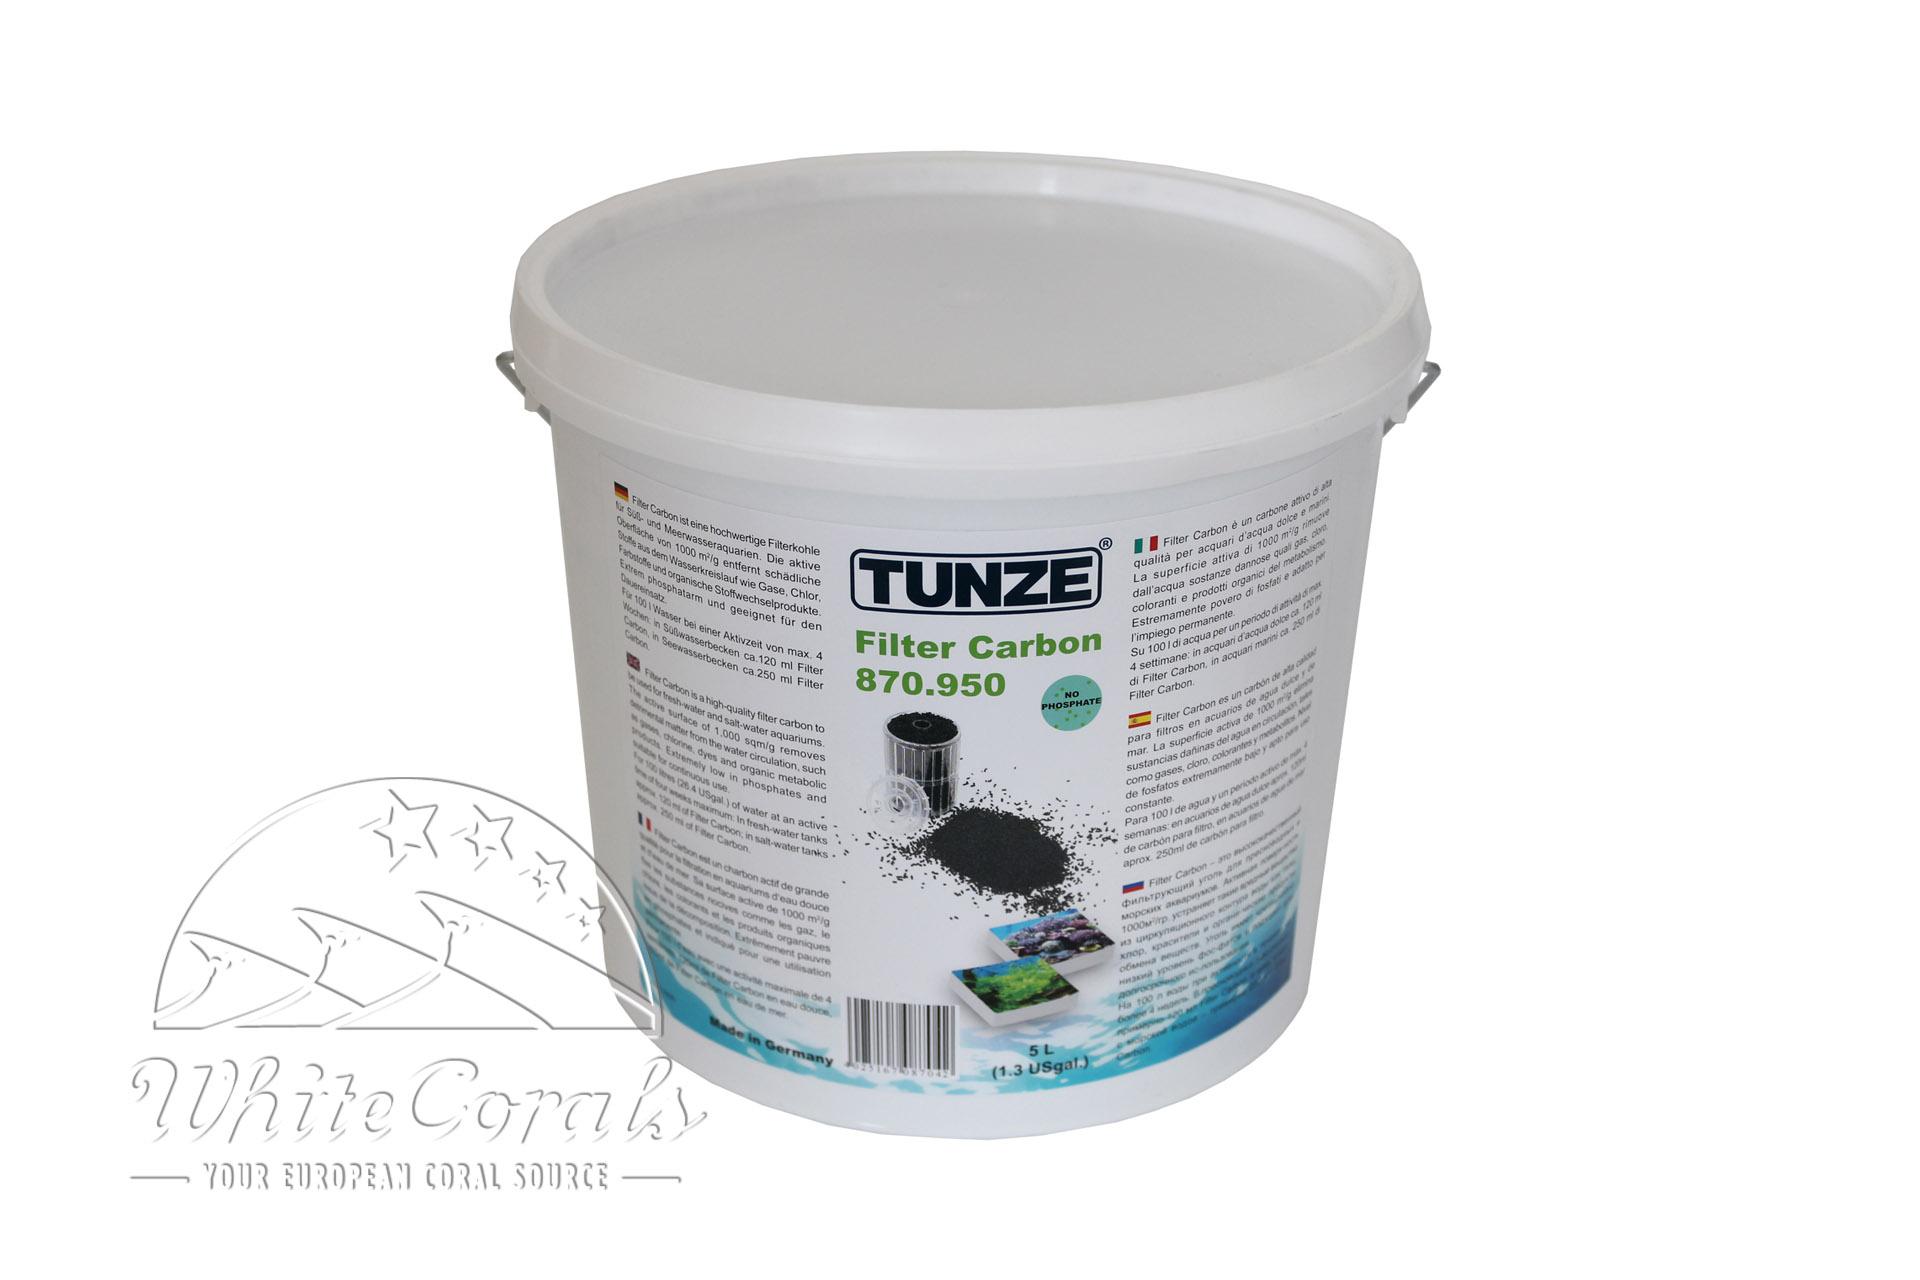 Tunze Filter Carbon 5 Liter Eimer